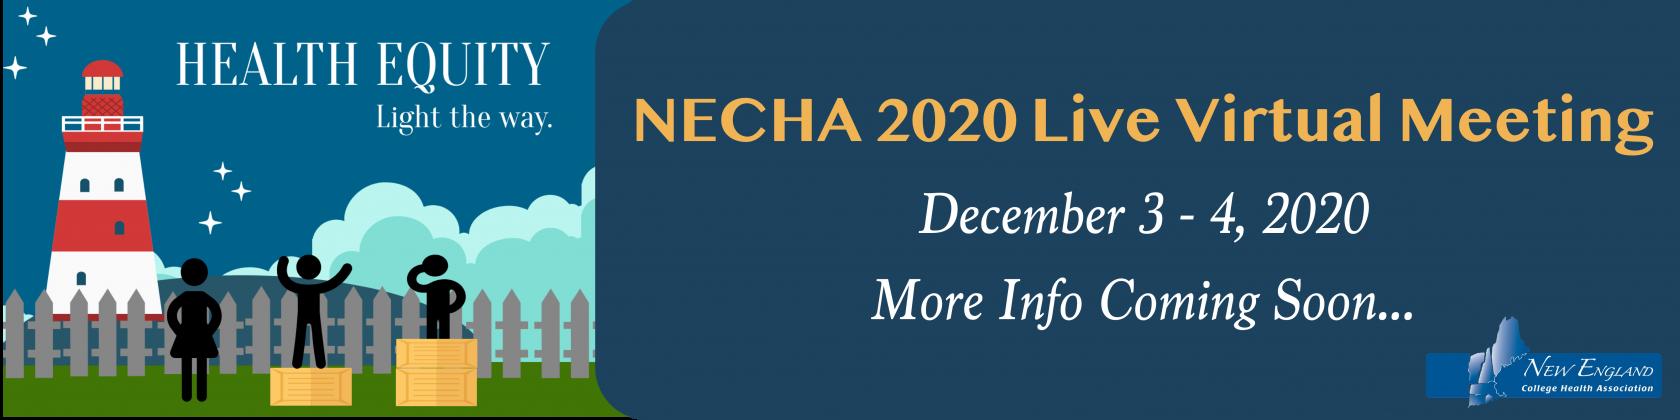 NECHA-2020-Web-Banner-DecDates